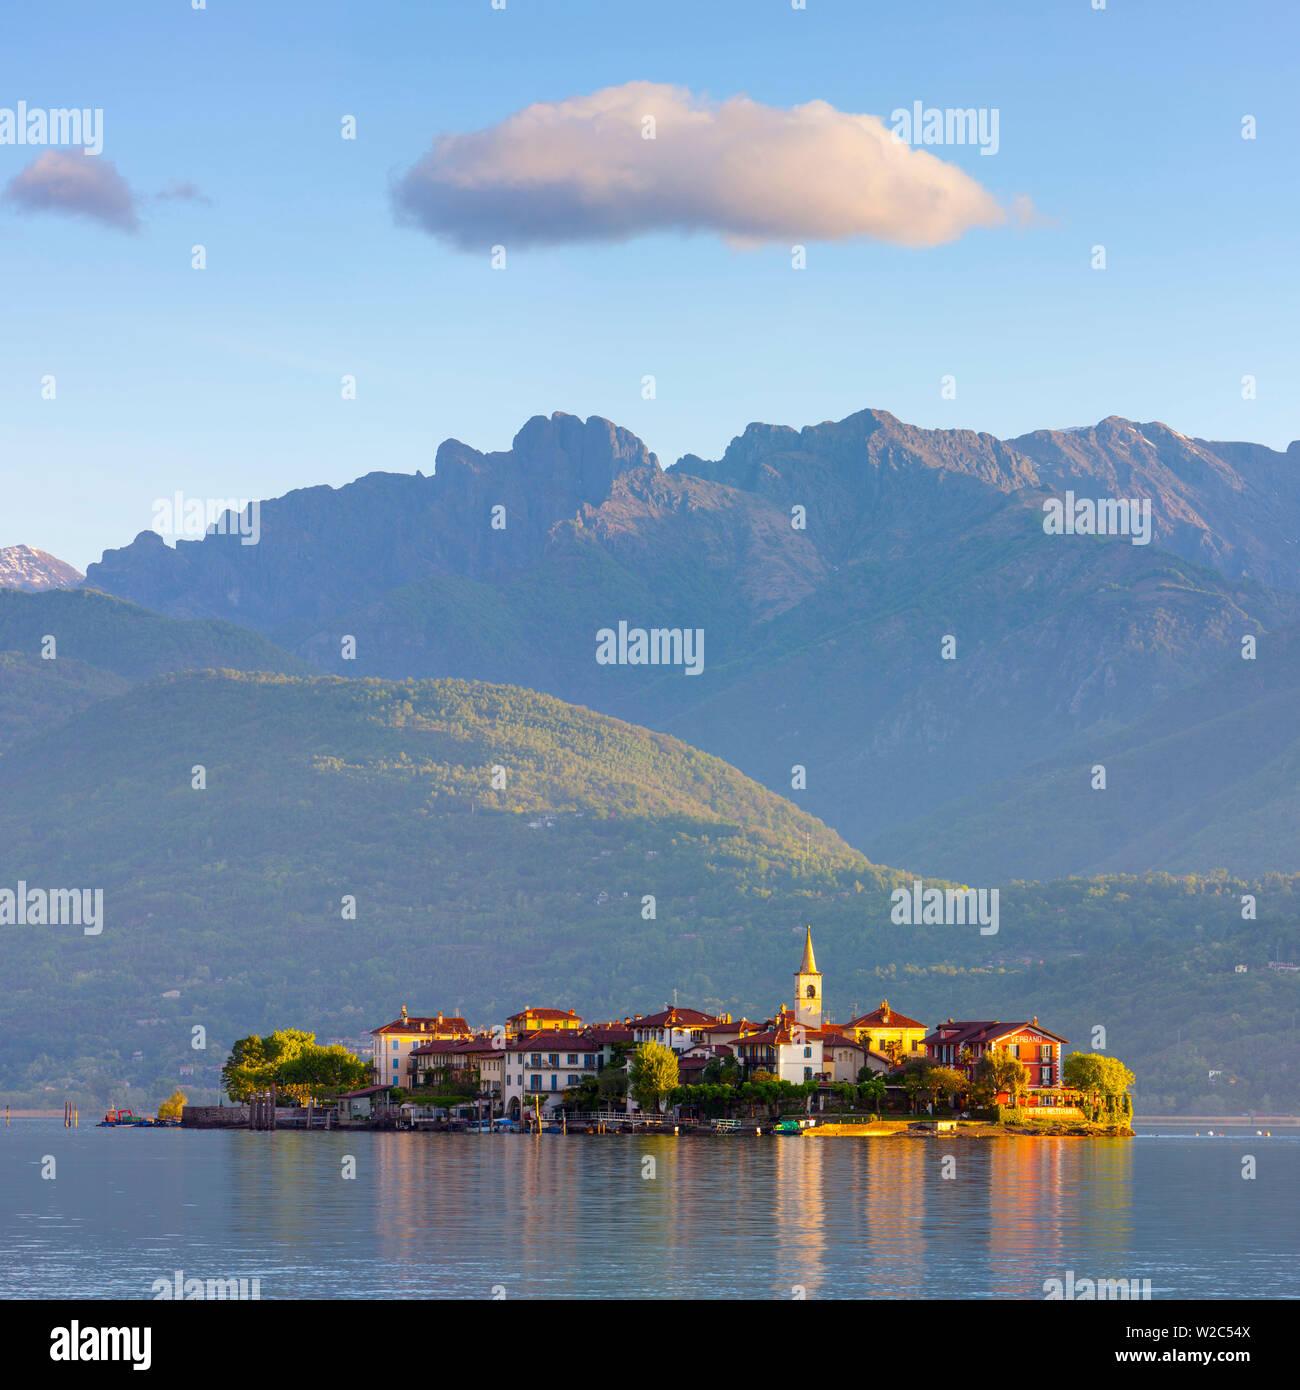 The idyllic Isola dei Pescatori (Fishermen's Islands) illuminated at sunrise, Borromean Islands, Lake Maggiore, Piedmont, Italy - Stock Image